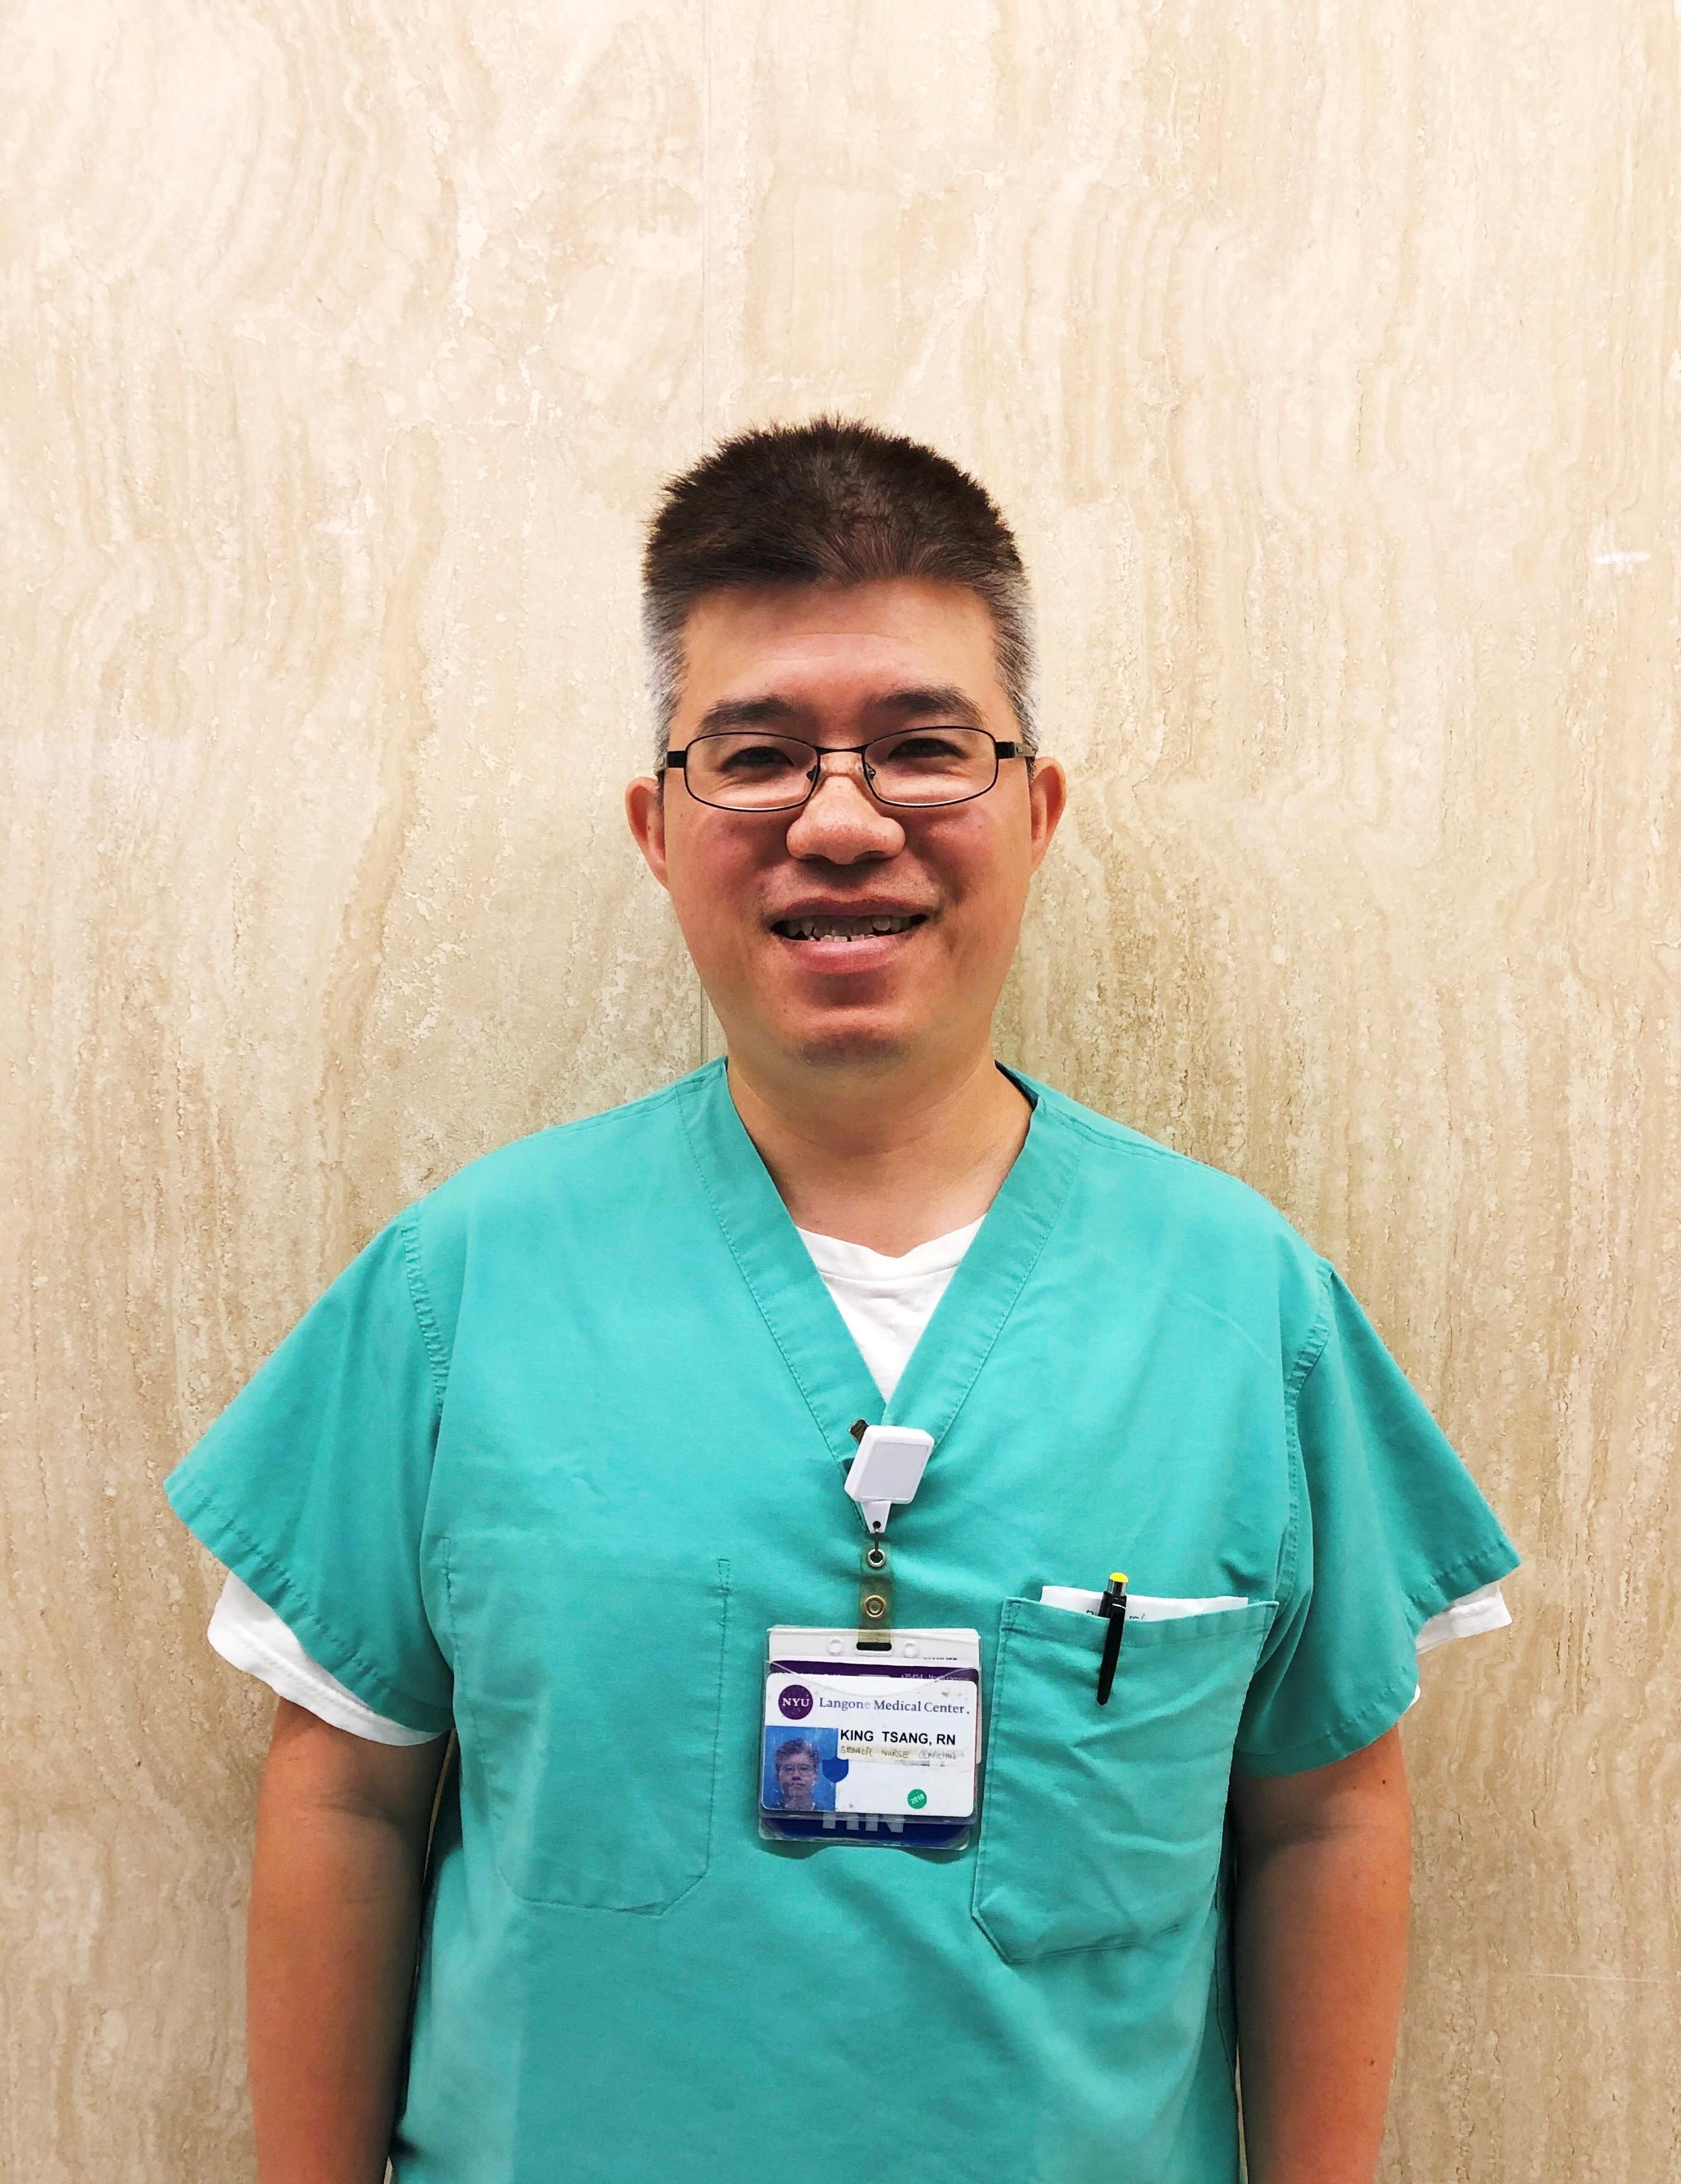 Nursing Jobs | NYU Langone Health